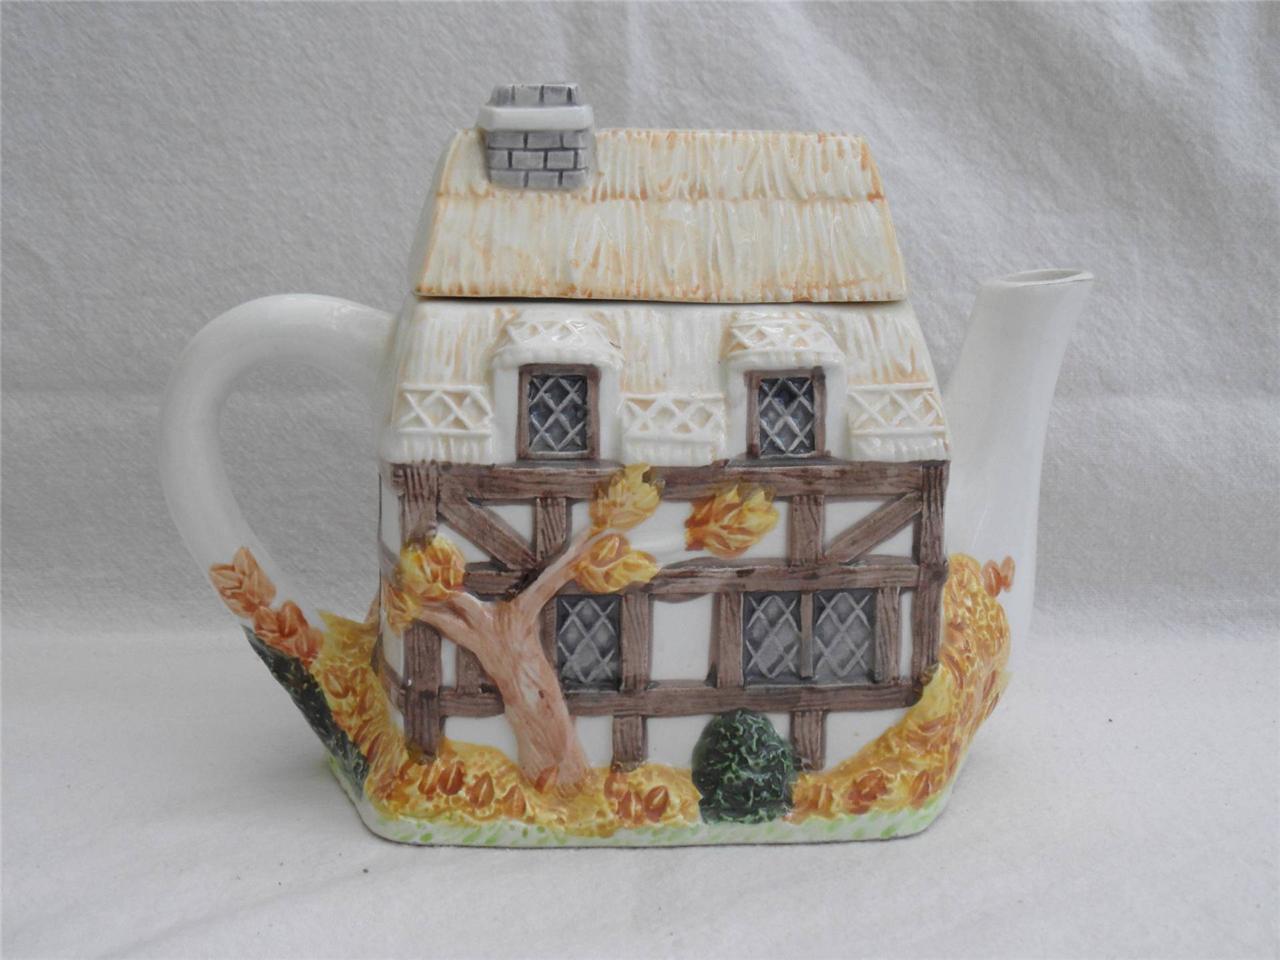 The-Village-Teapot-handpainted-autumn-cottage-collectable-FREE-UK-P-P